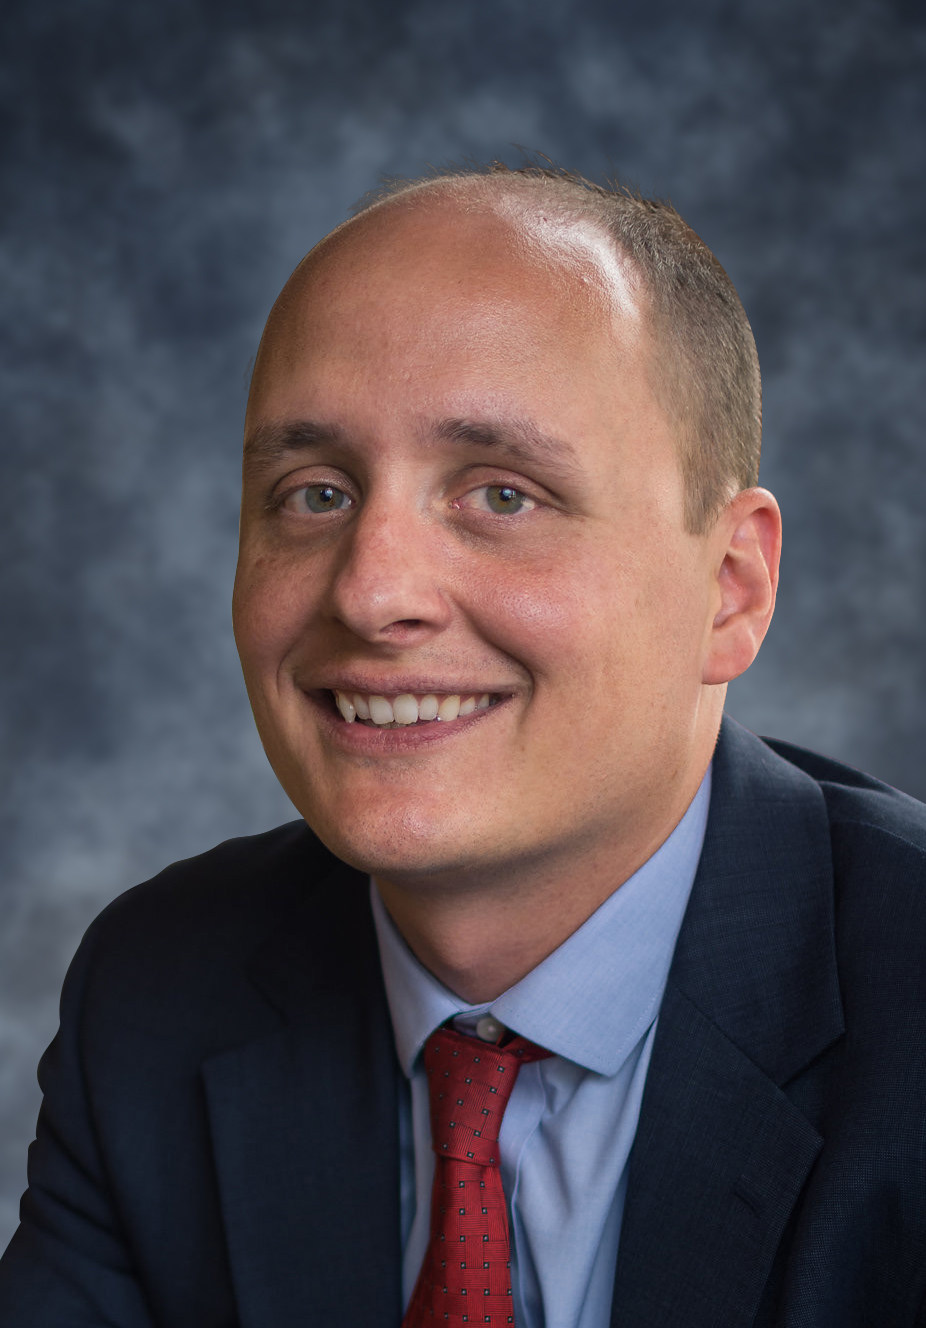 Commissioner Sam Gladney